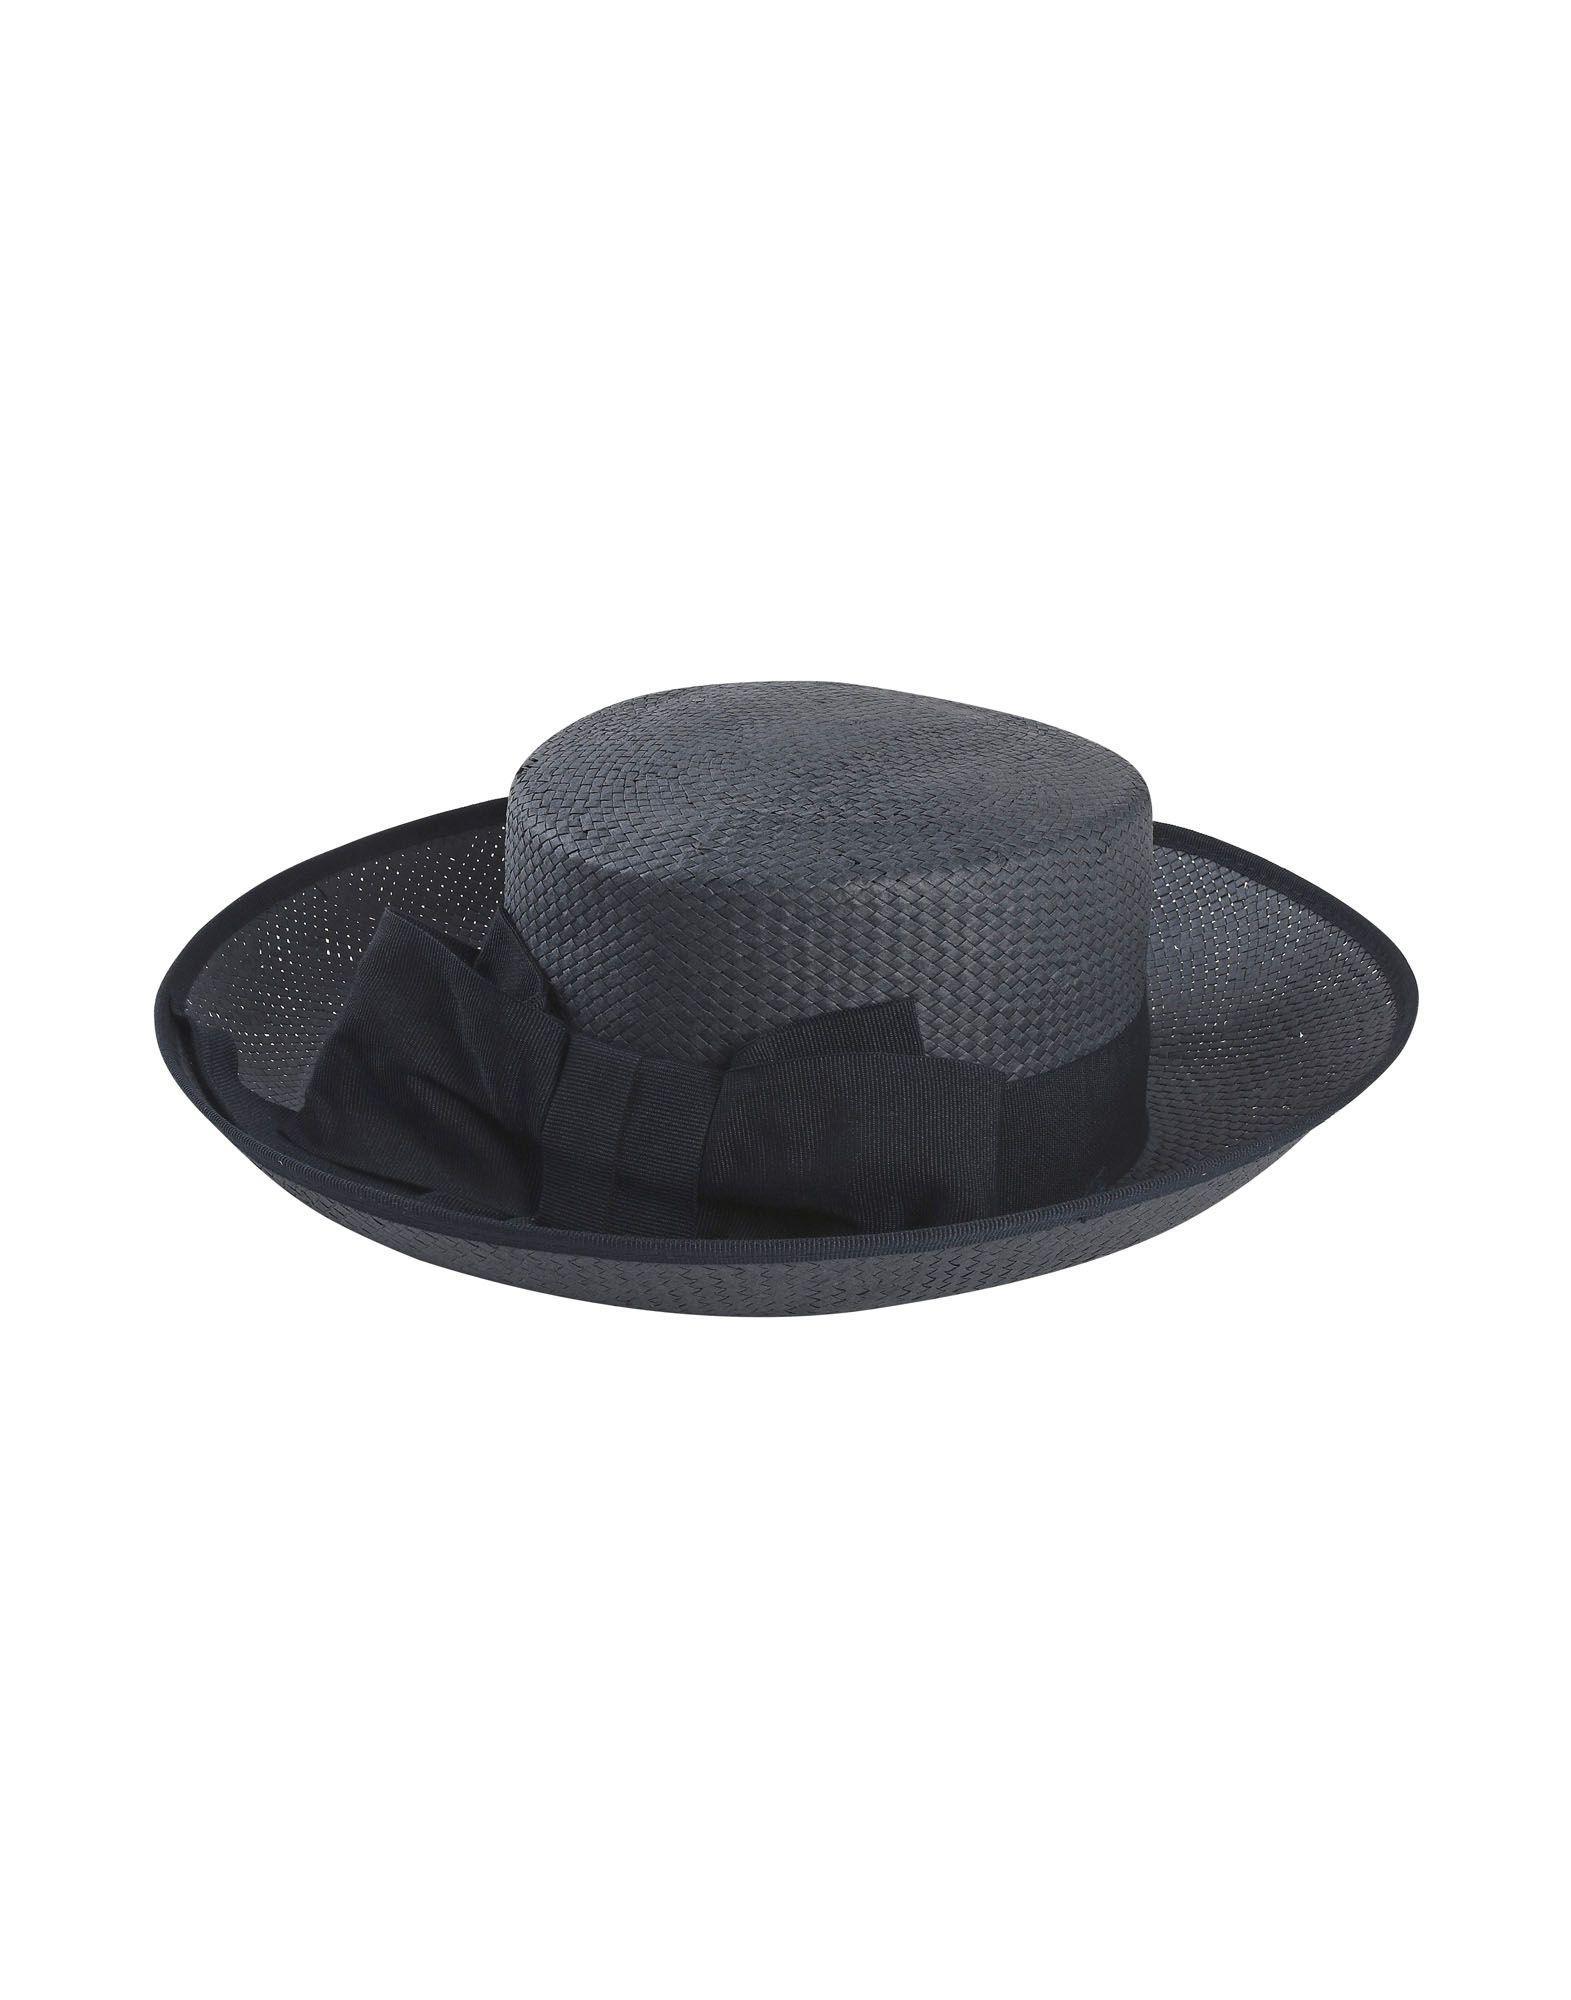 ACCESSORIES - Hats Suoli 6jTqBkNZeF